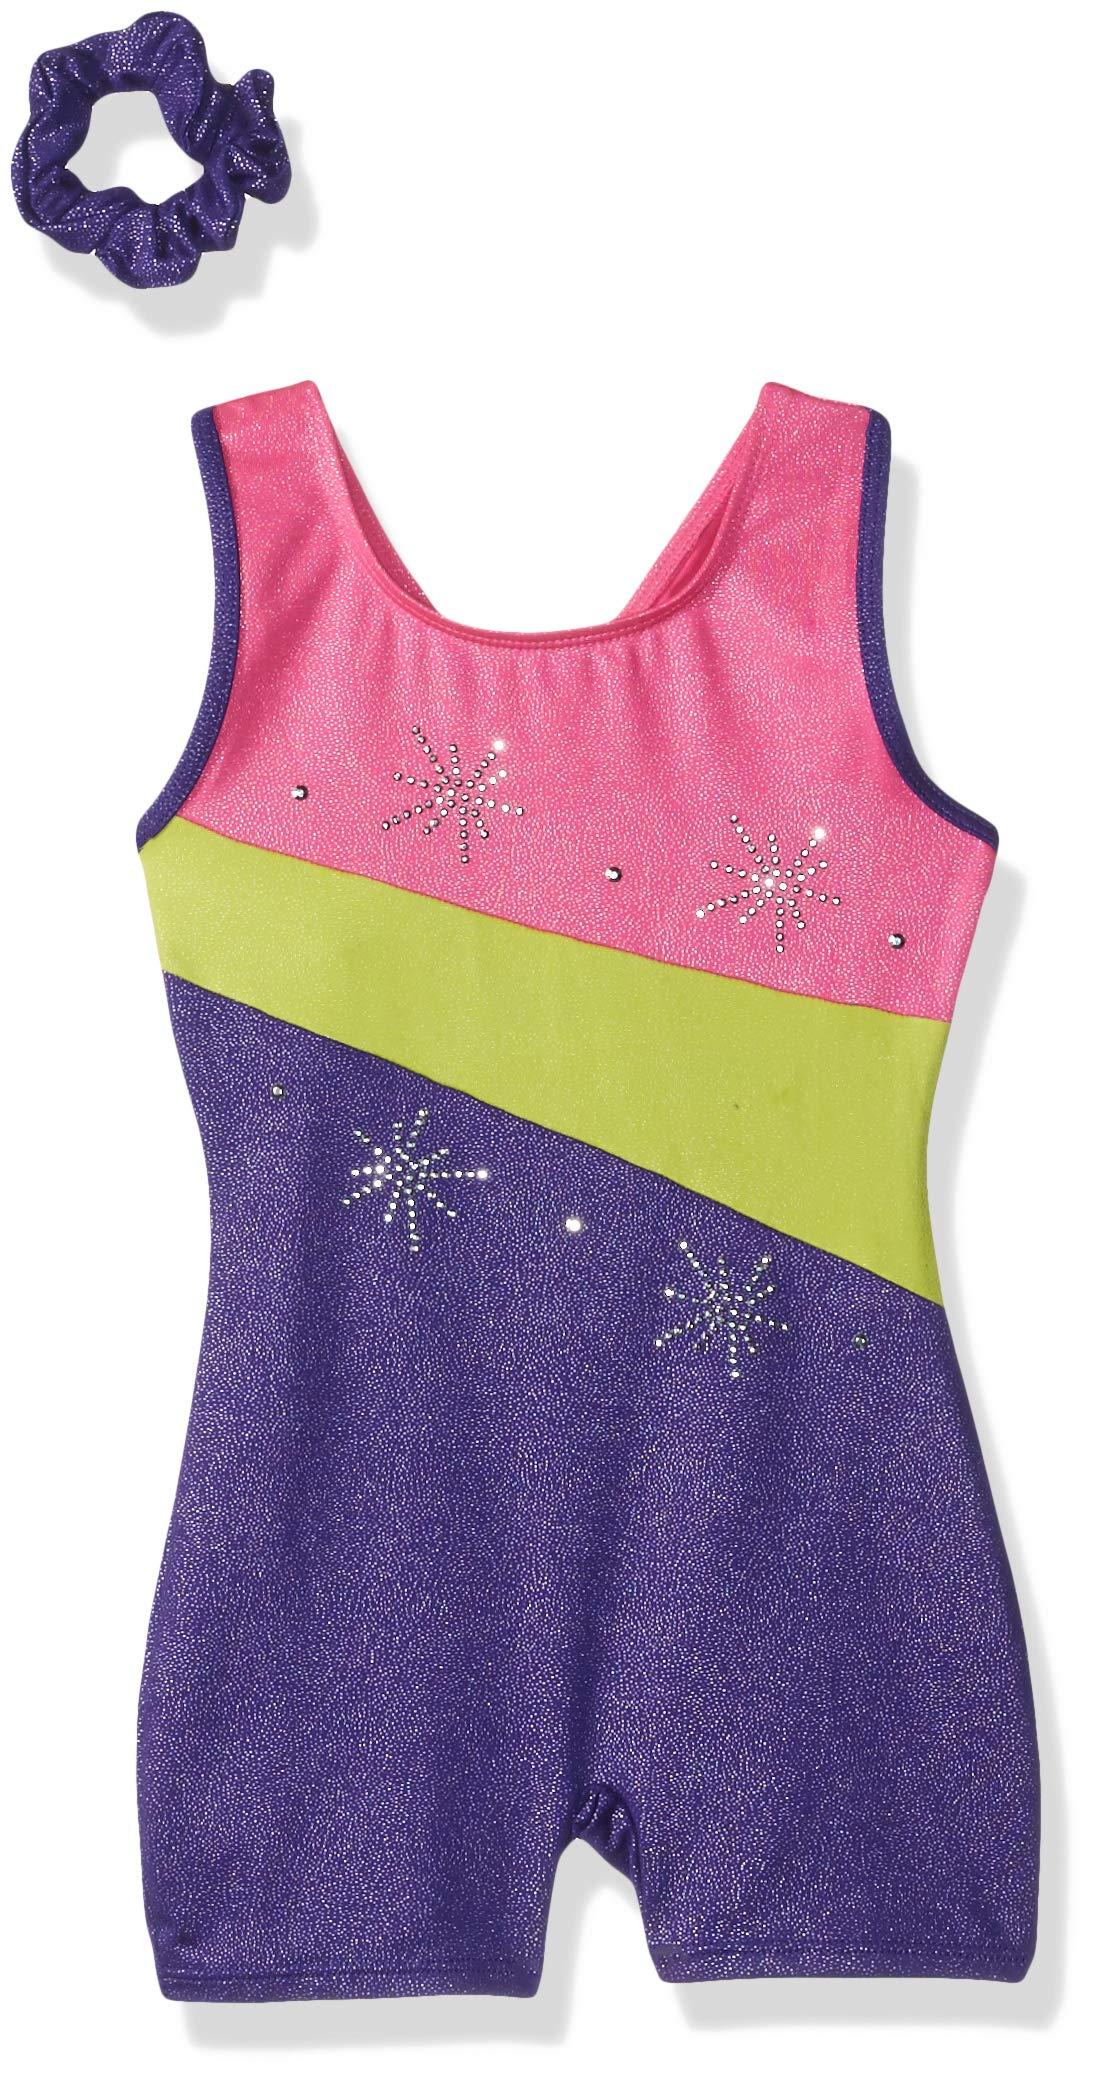 Jacques Moret Big Girls' Fun Gymnastics Biketard, Cosmo Sky Pink/Yellow/Purple, M